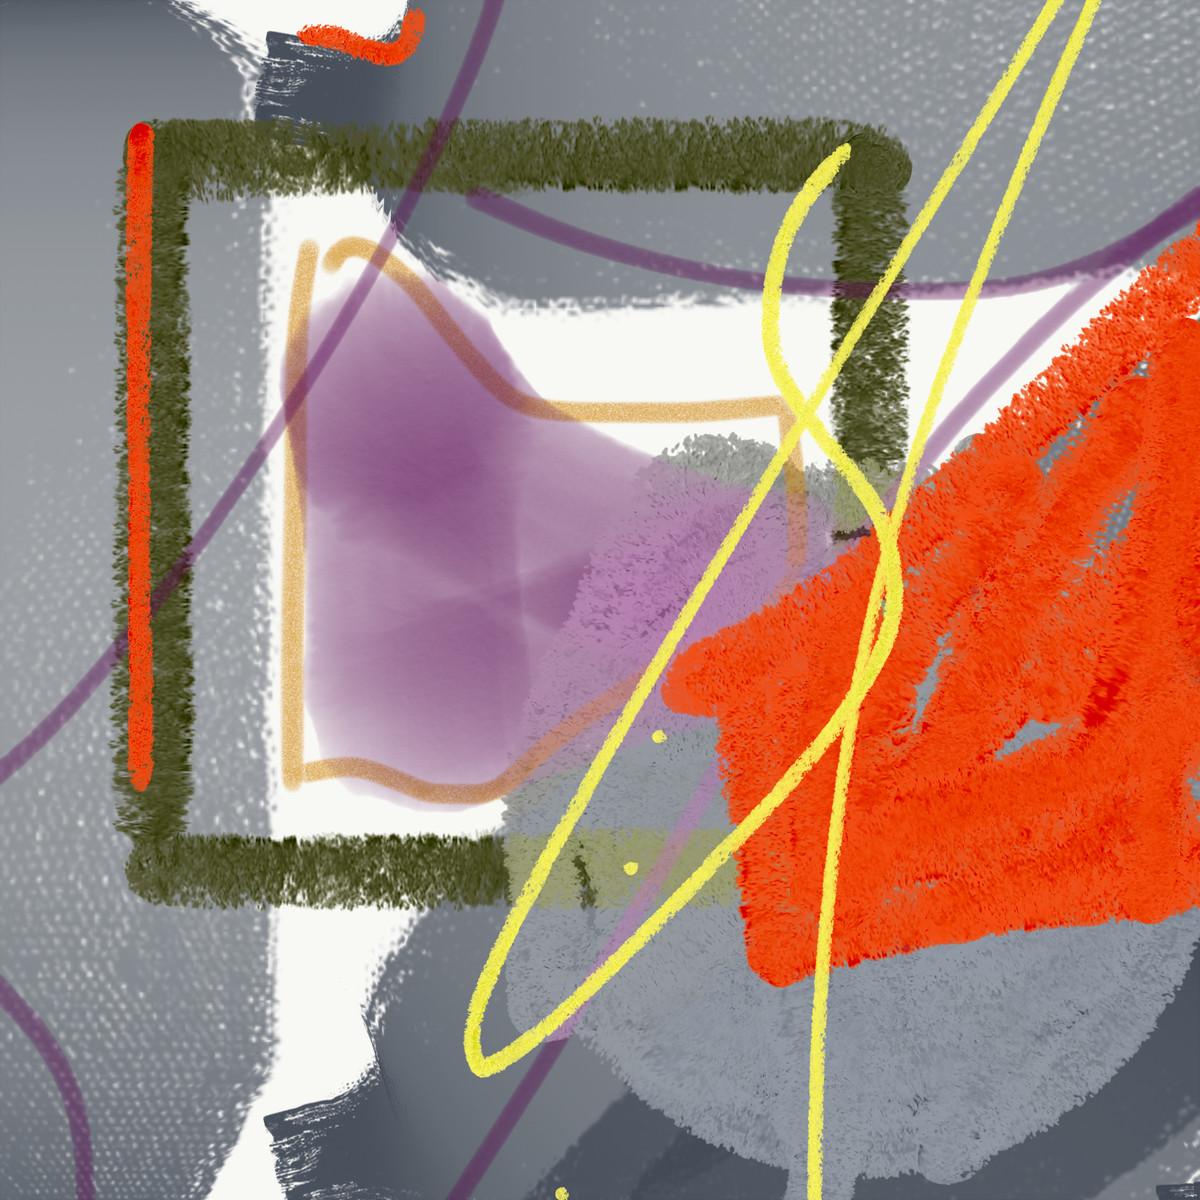 ABSTRACT by Suvarna Dheringe, Abstract, Digital Digital Art, Digital Print on Canvas, Mamba color